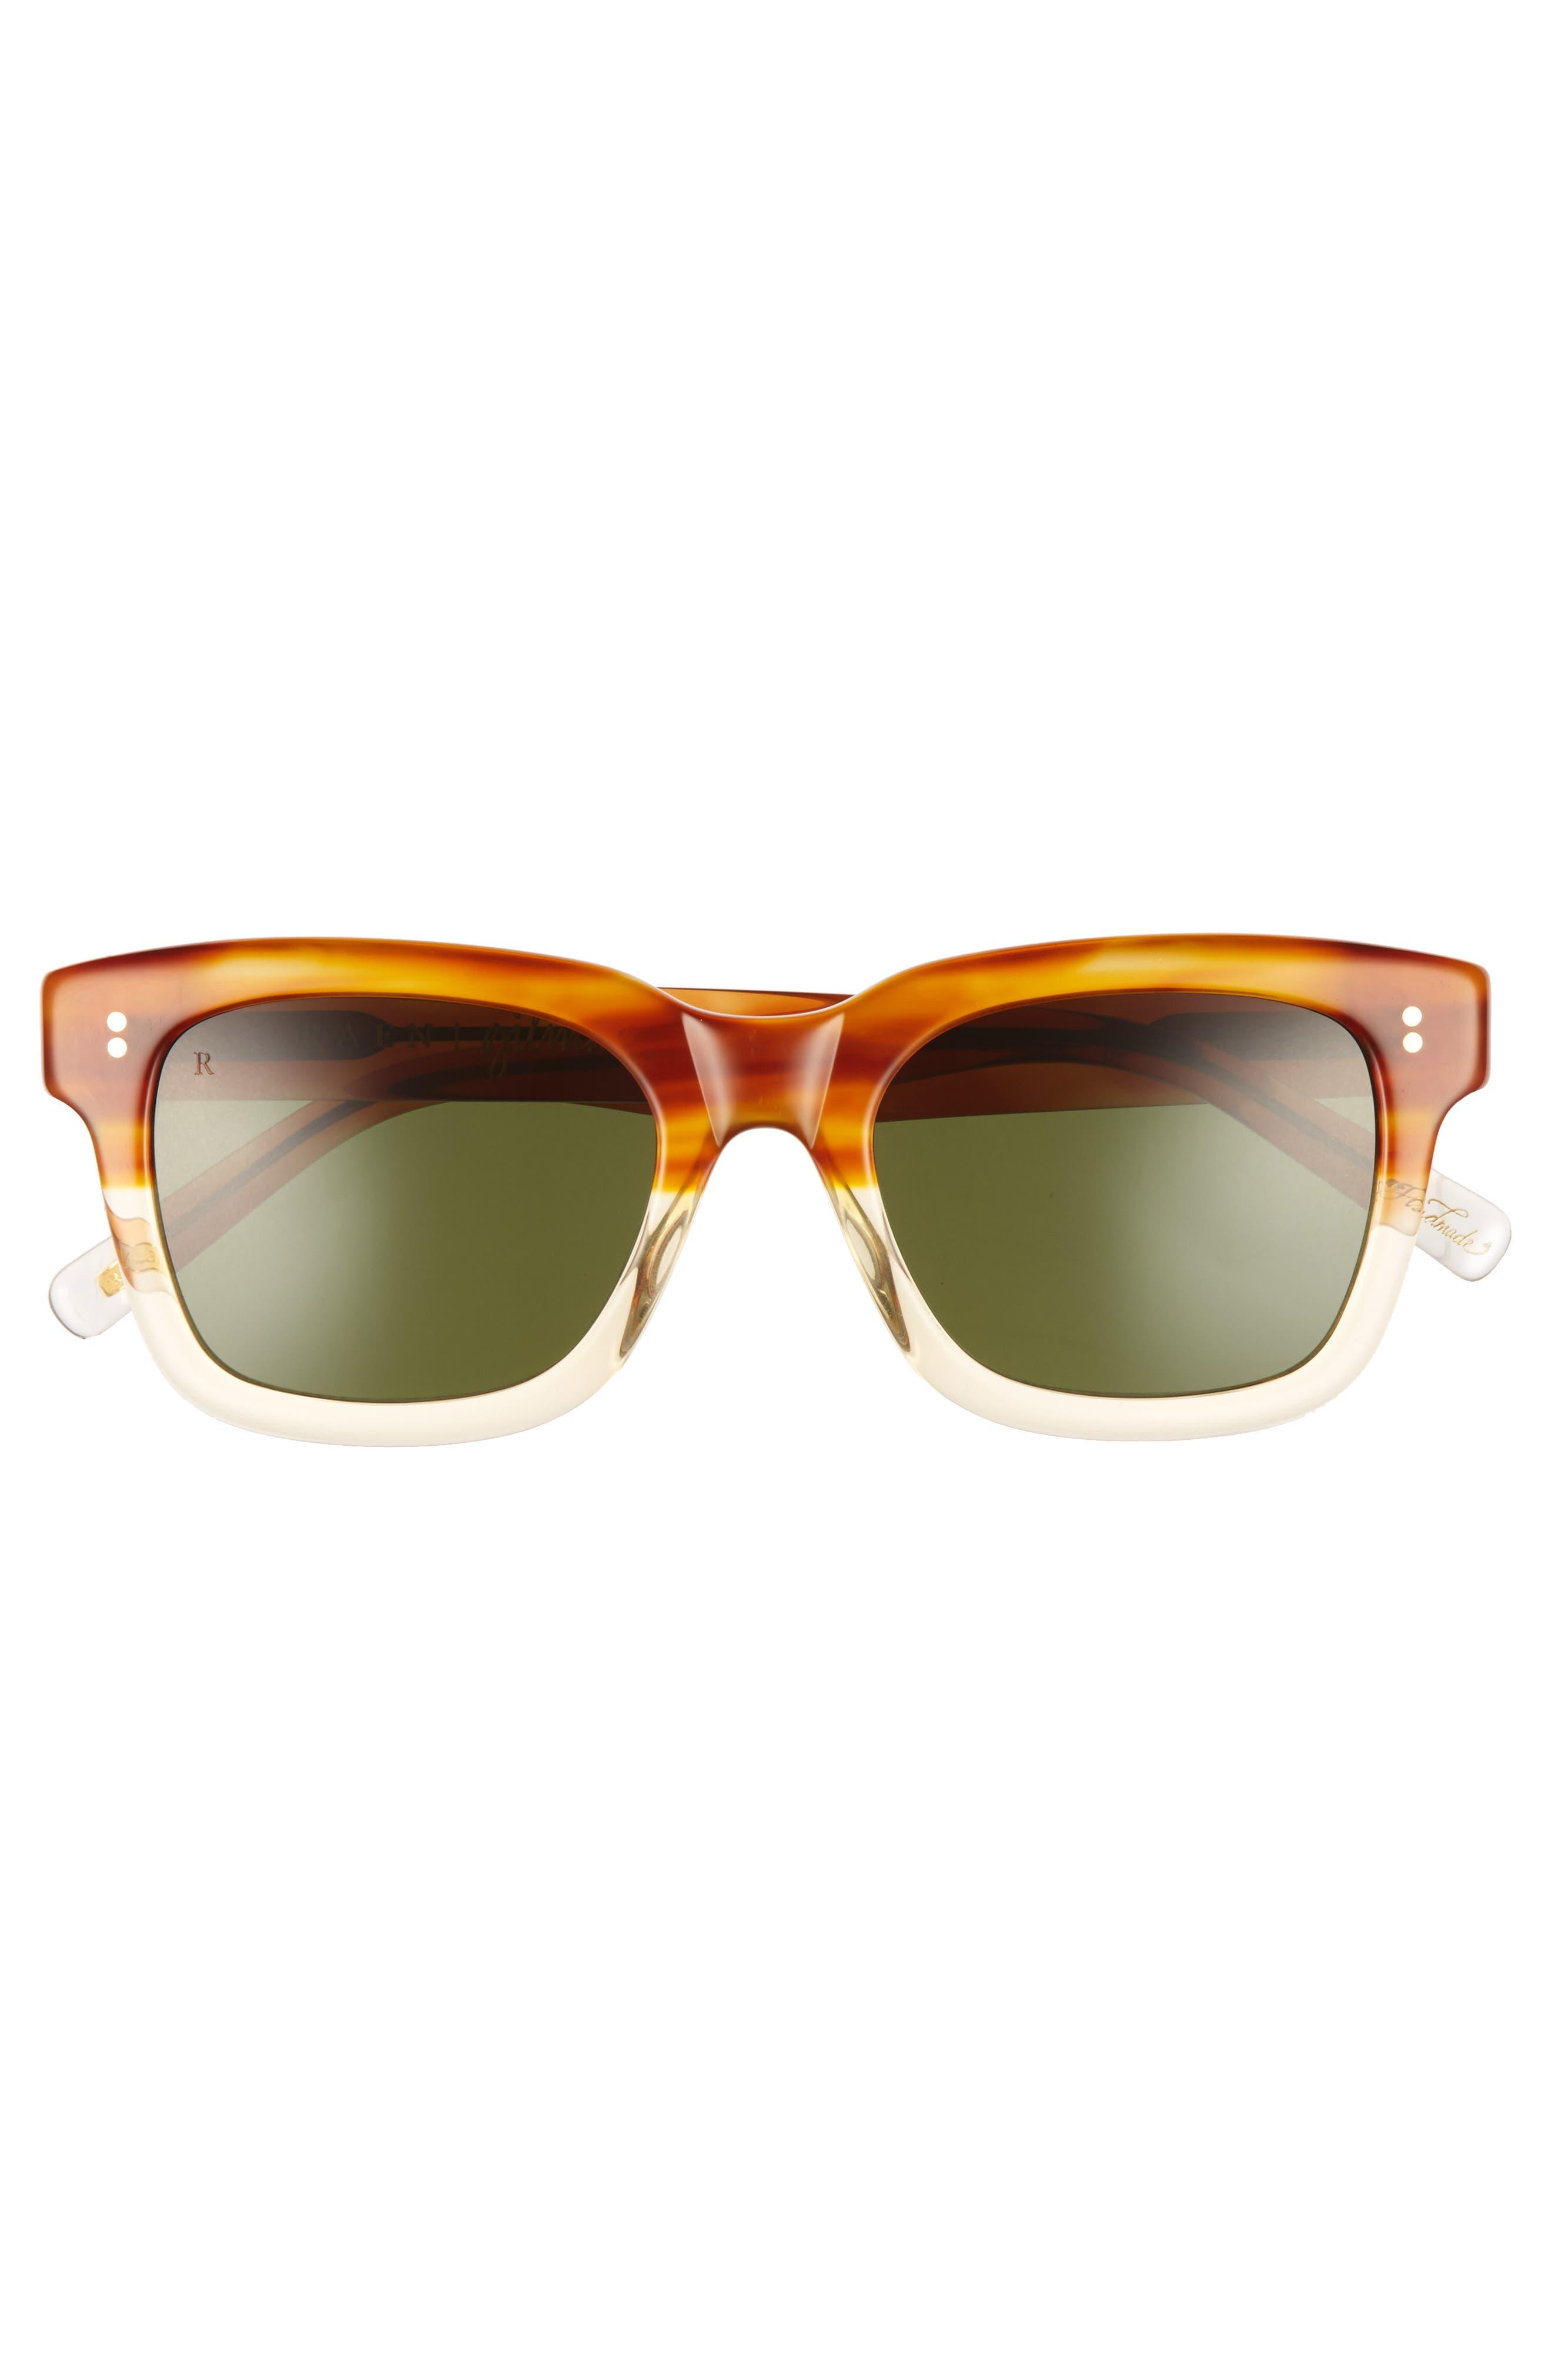 Gilman 52mm Polarized Sunglasses,                             Alternate thumbnail 2, color,                             Honey Havana/ Green